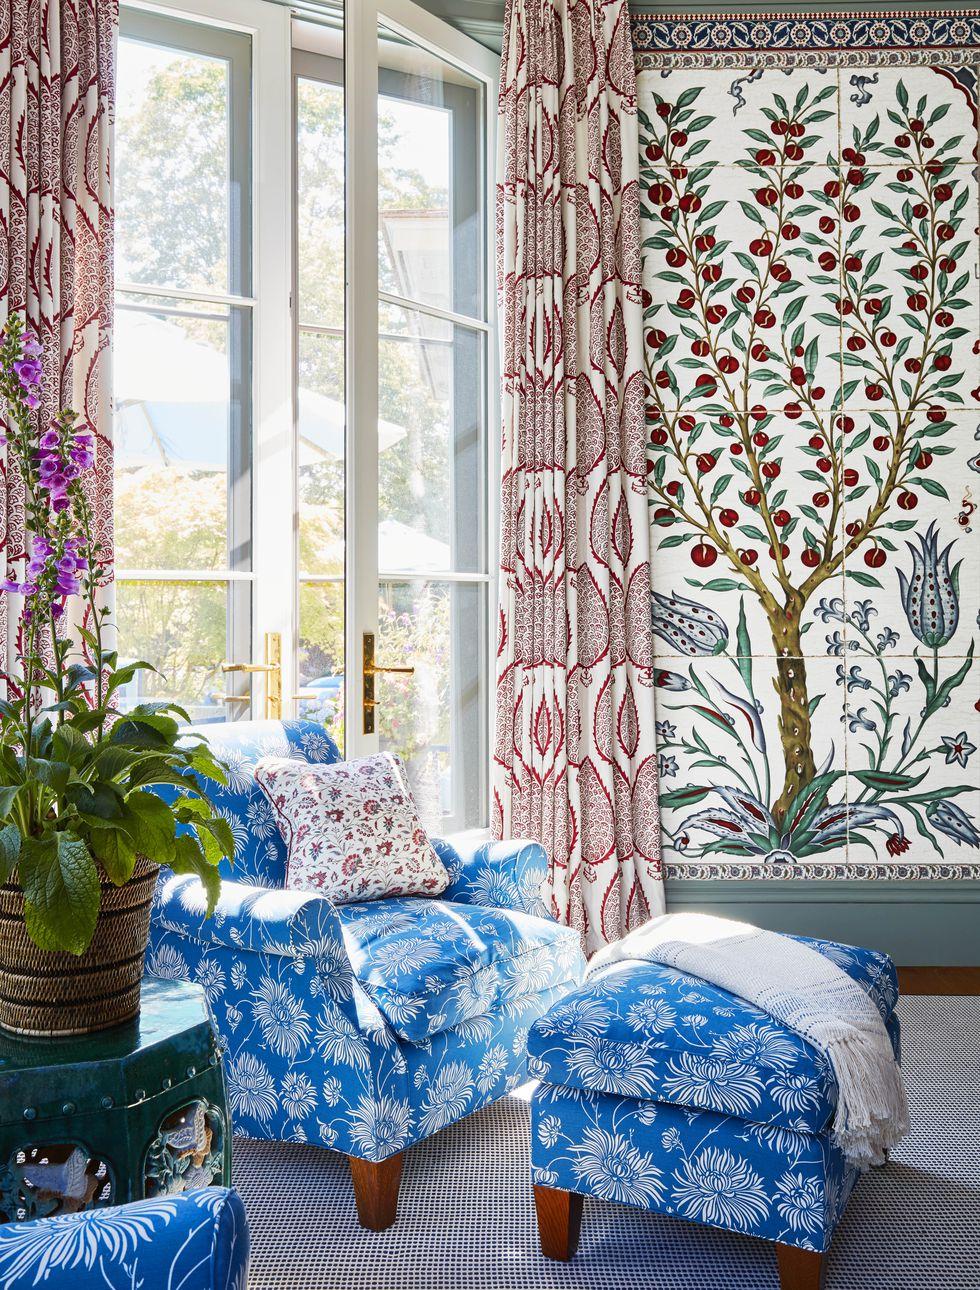 katie-ridder-hamptons-living-room-chair-veranda-1556139406.jpg